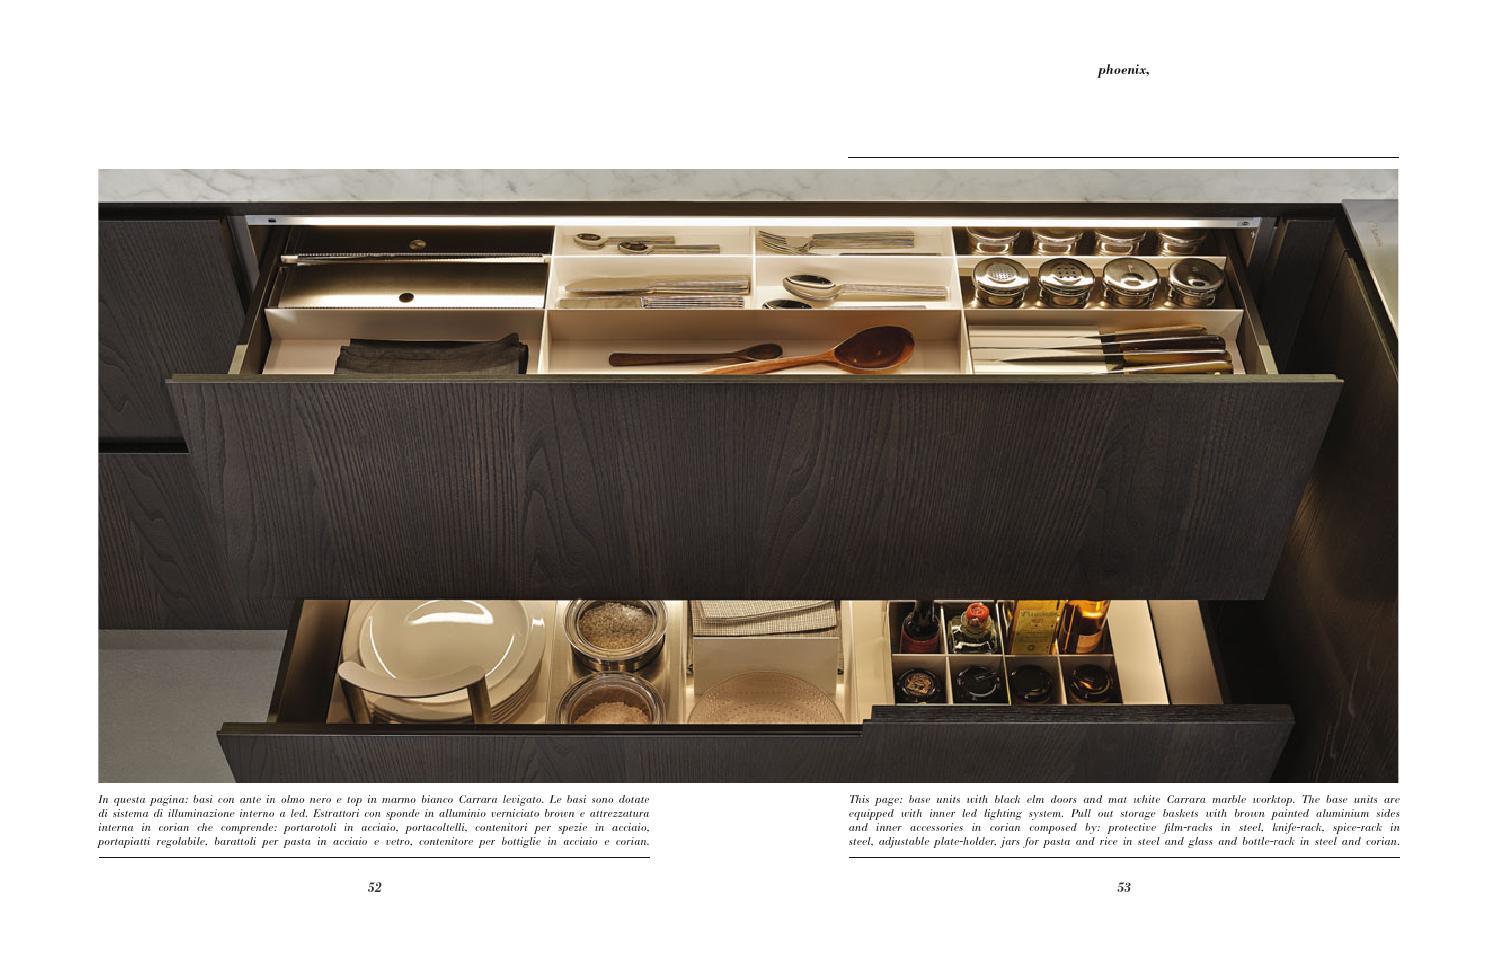 Sistemi Di Illuminazione A Led poliform kitchen collection 2014 by space furniture - issuu